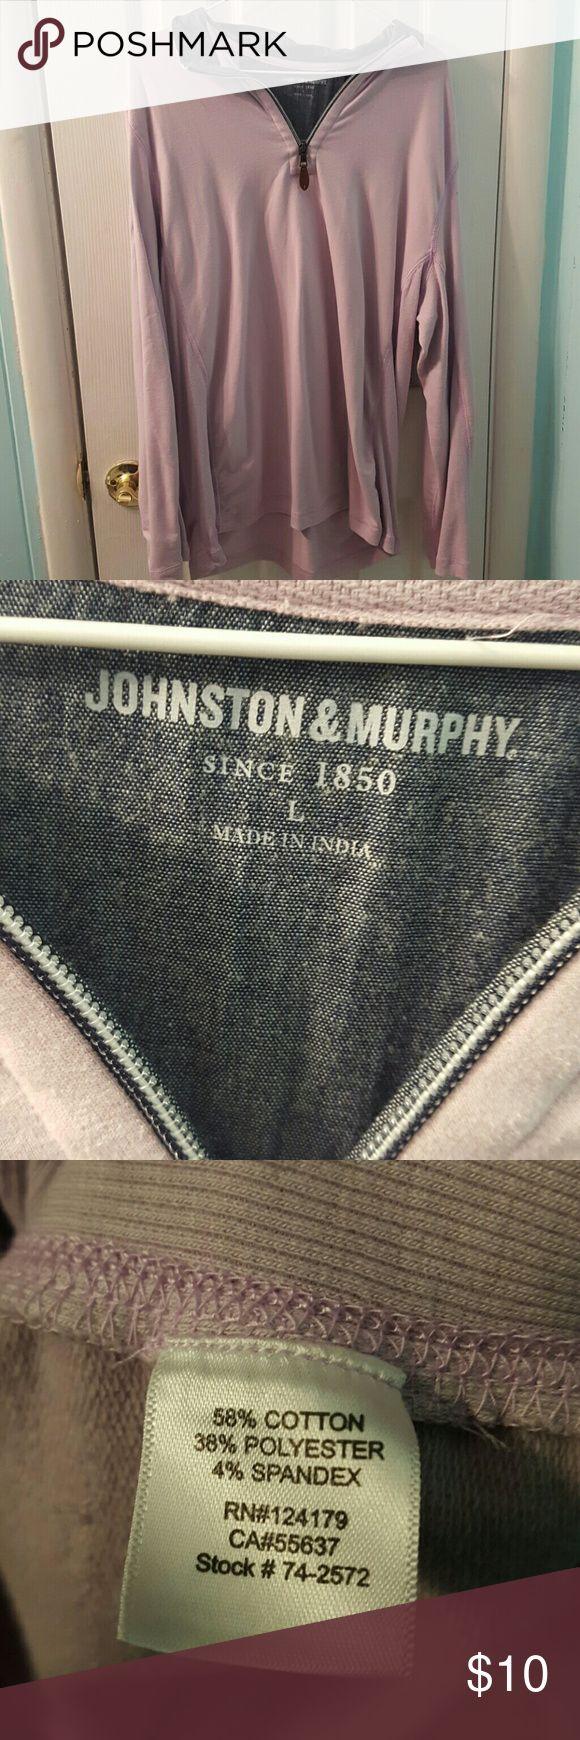 Johnston & Murphy mens lavender sweatshirt Good pre-owned condition Johnston & Murphy Shirts Sweatshirts & Hoodies